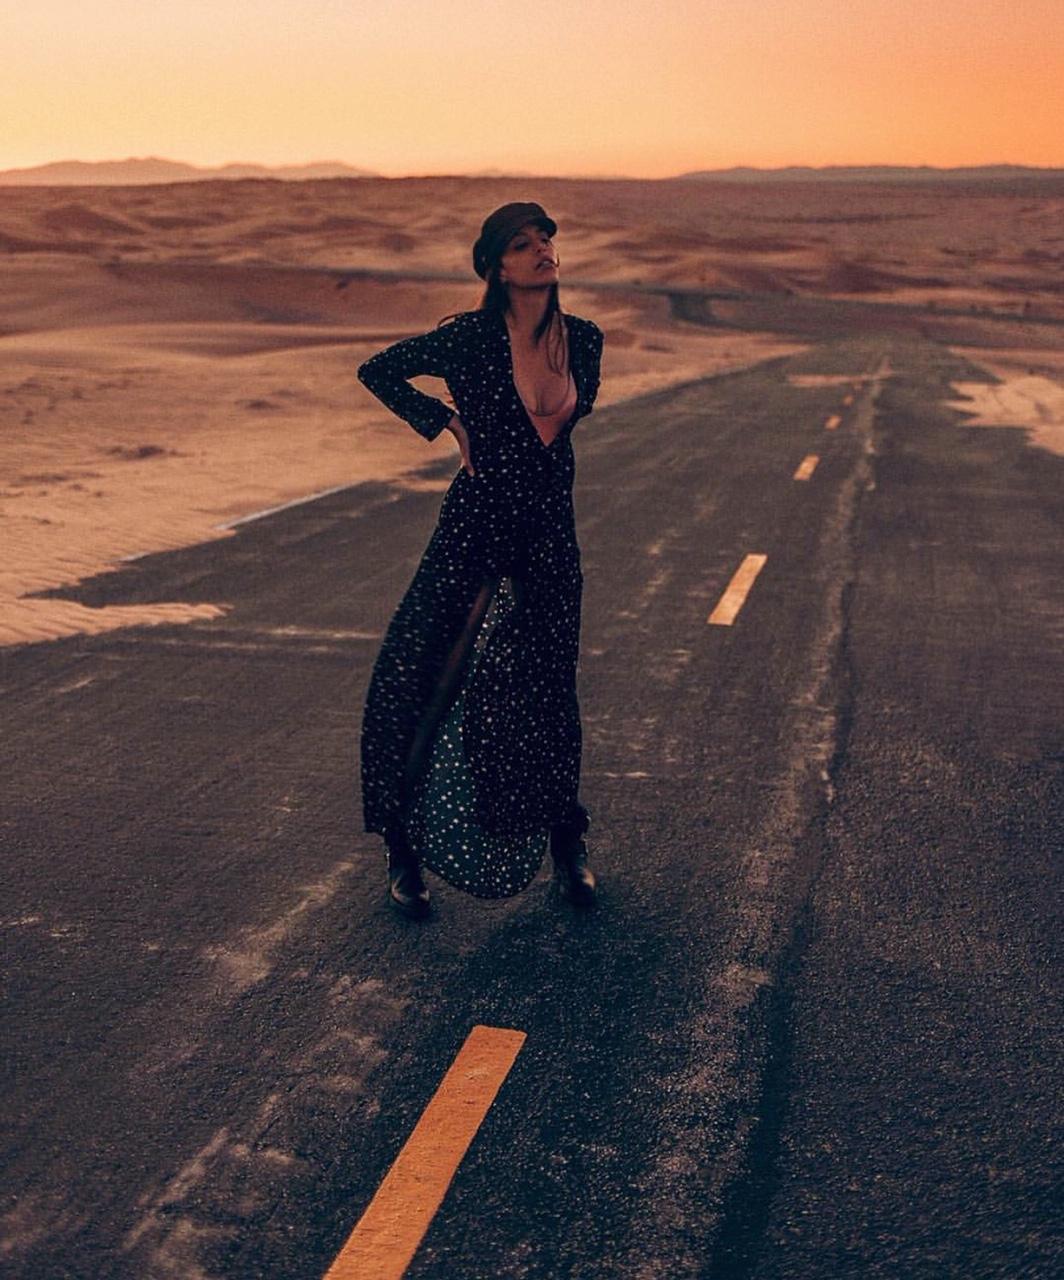 Photographer: Cam Mackey | Model: Rouge Apker | Styling: Jess Turner | Makeup by Ashley Tani